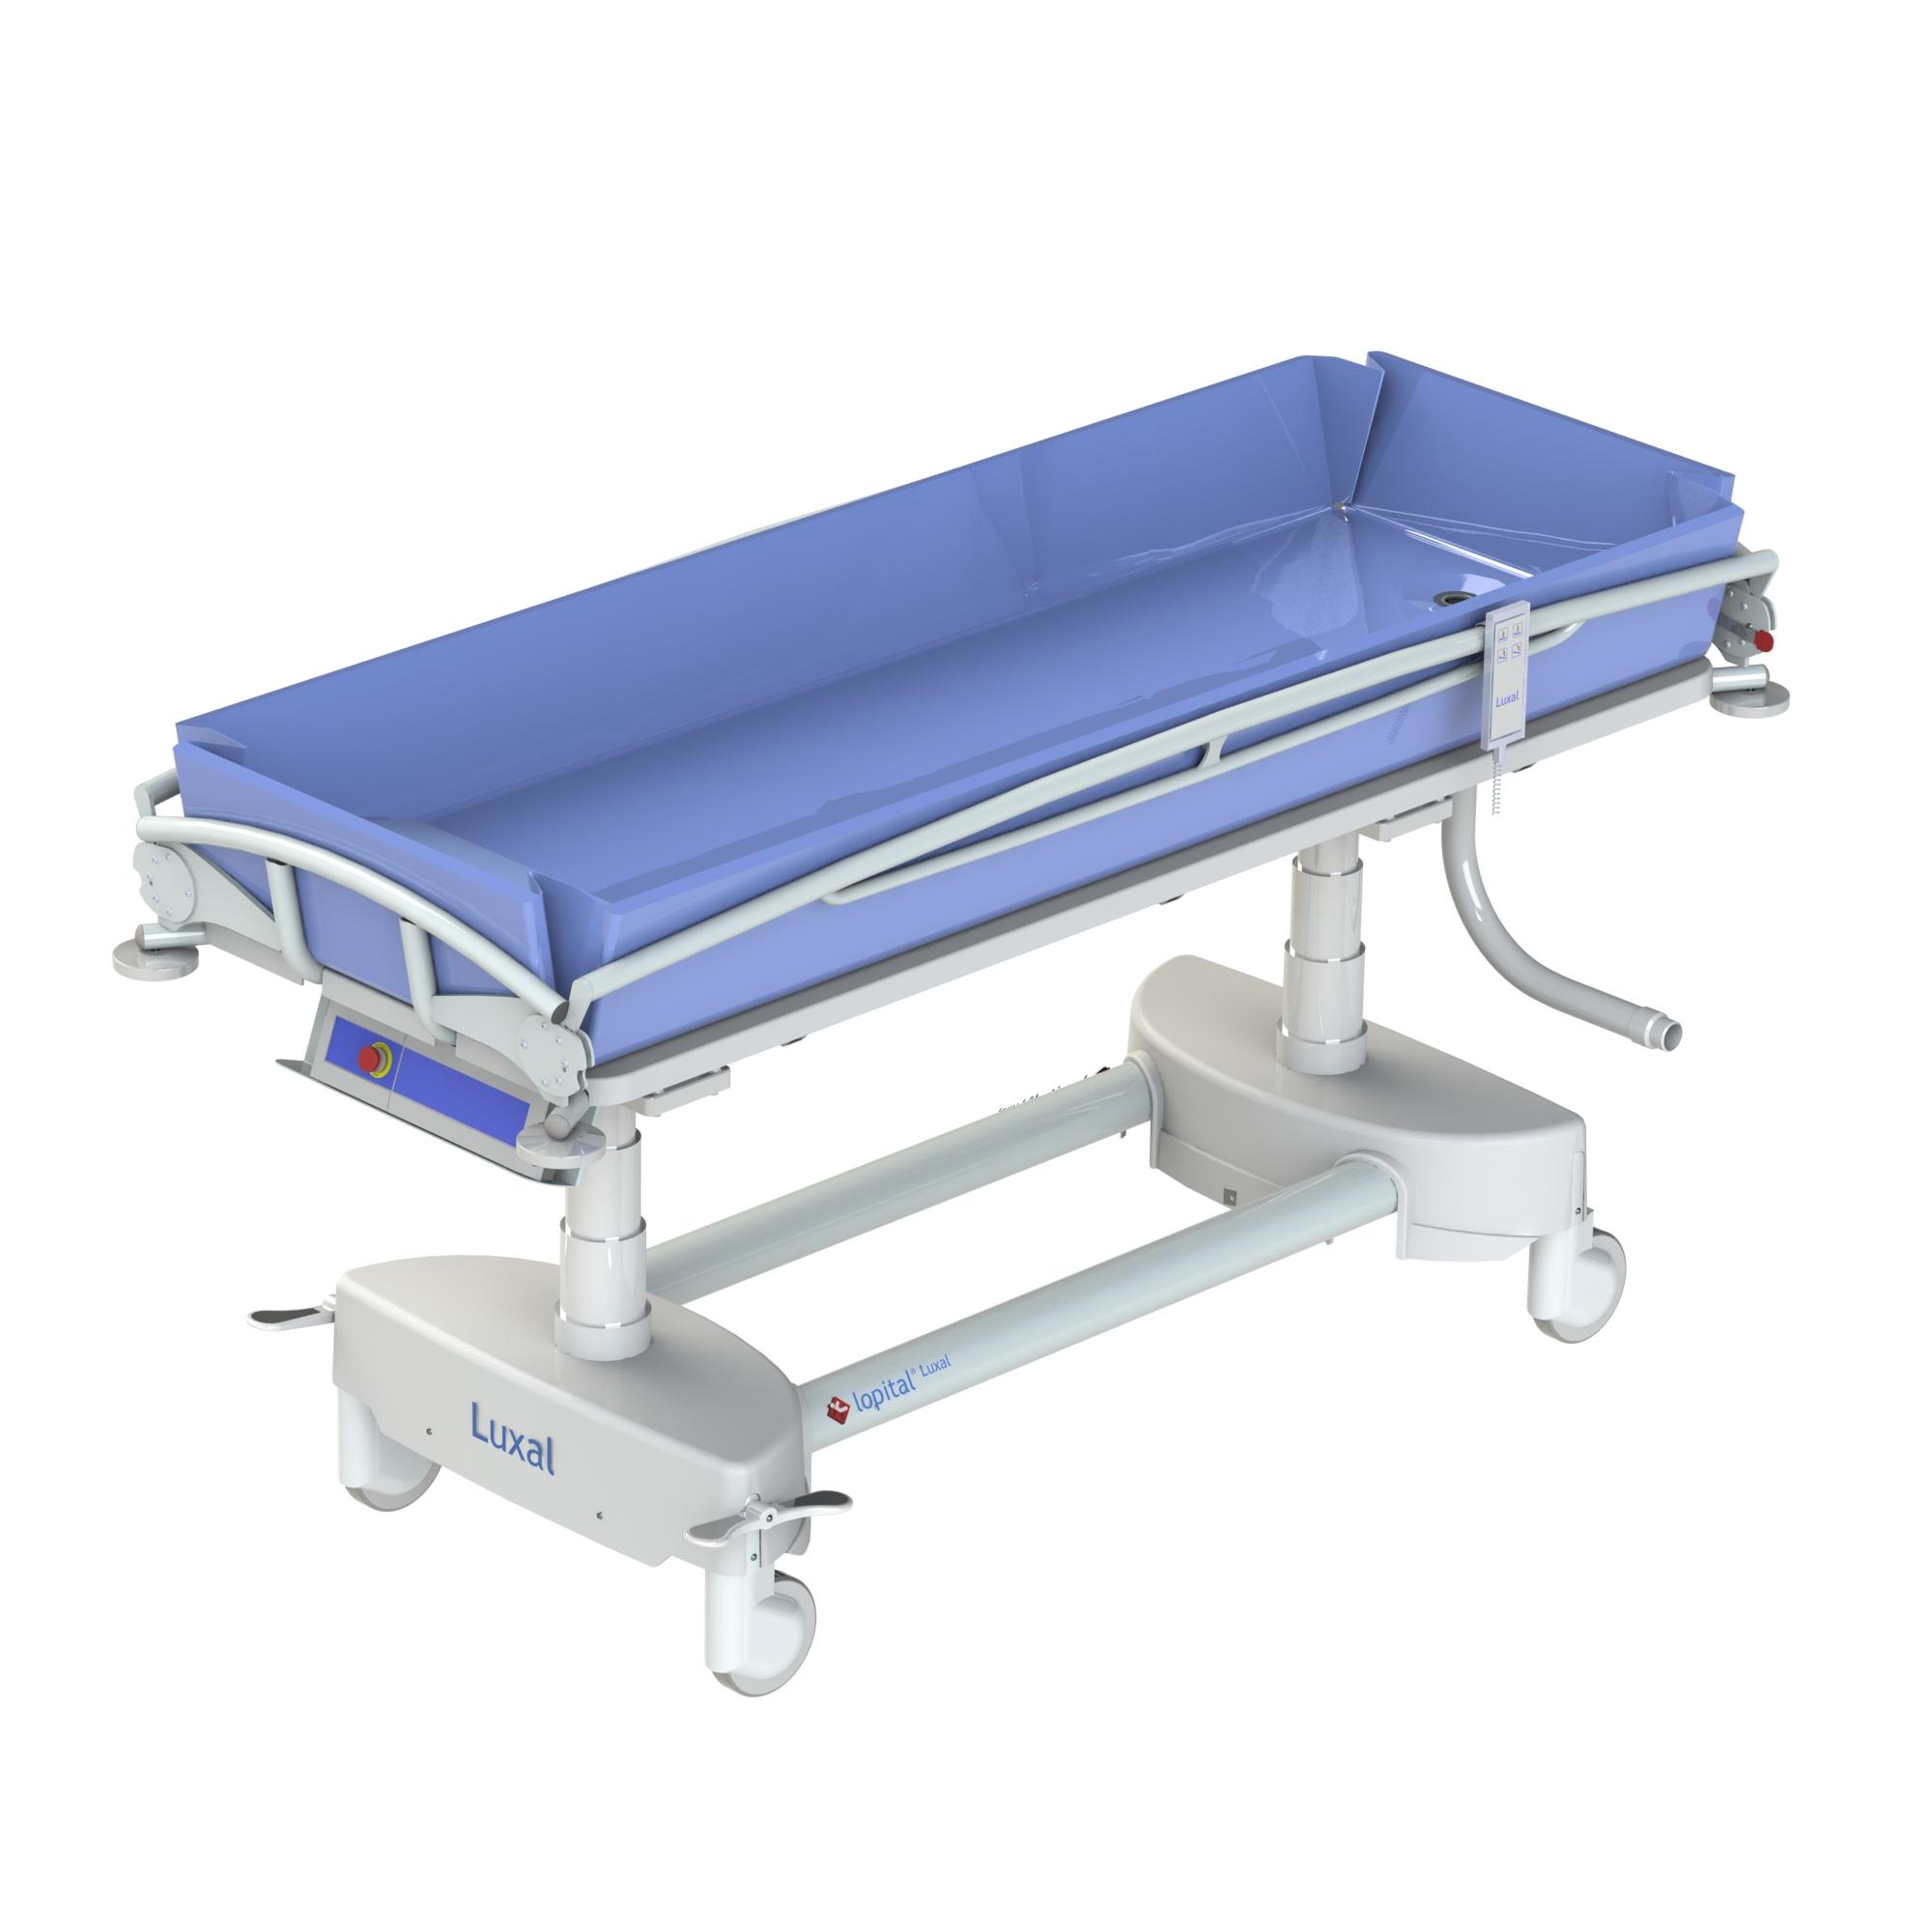 trolley chair en lopital shower and toiletstoel douche toilet elexo chairs